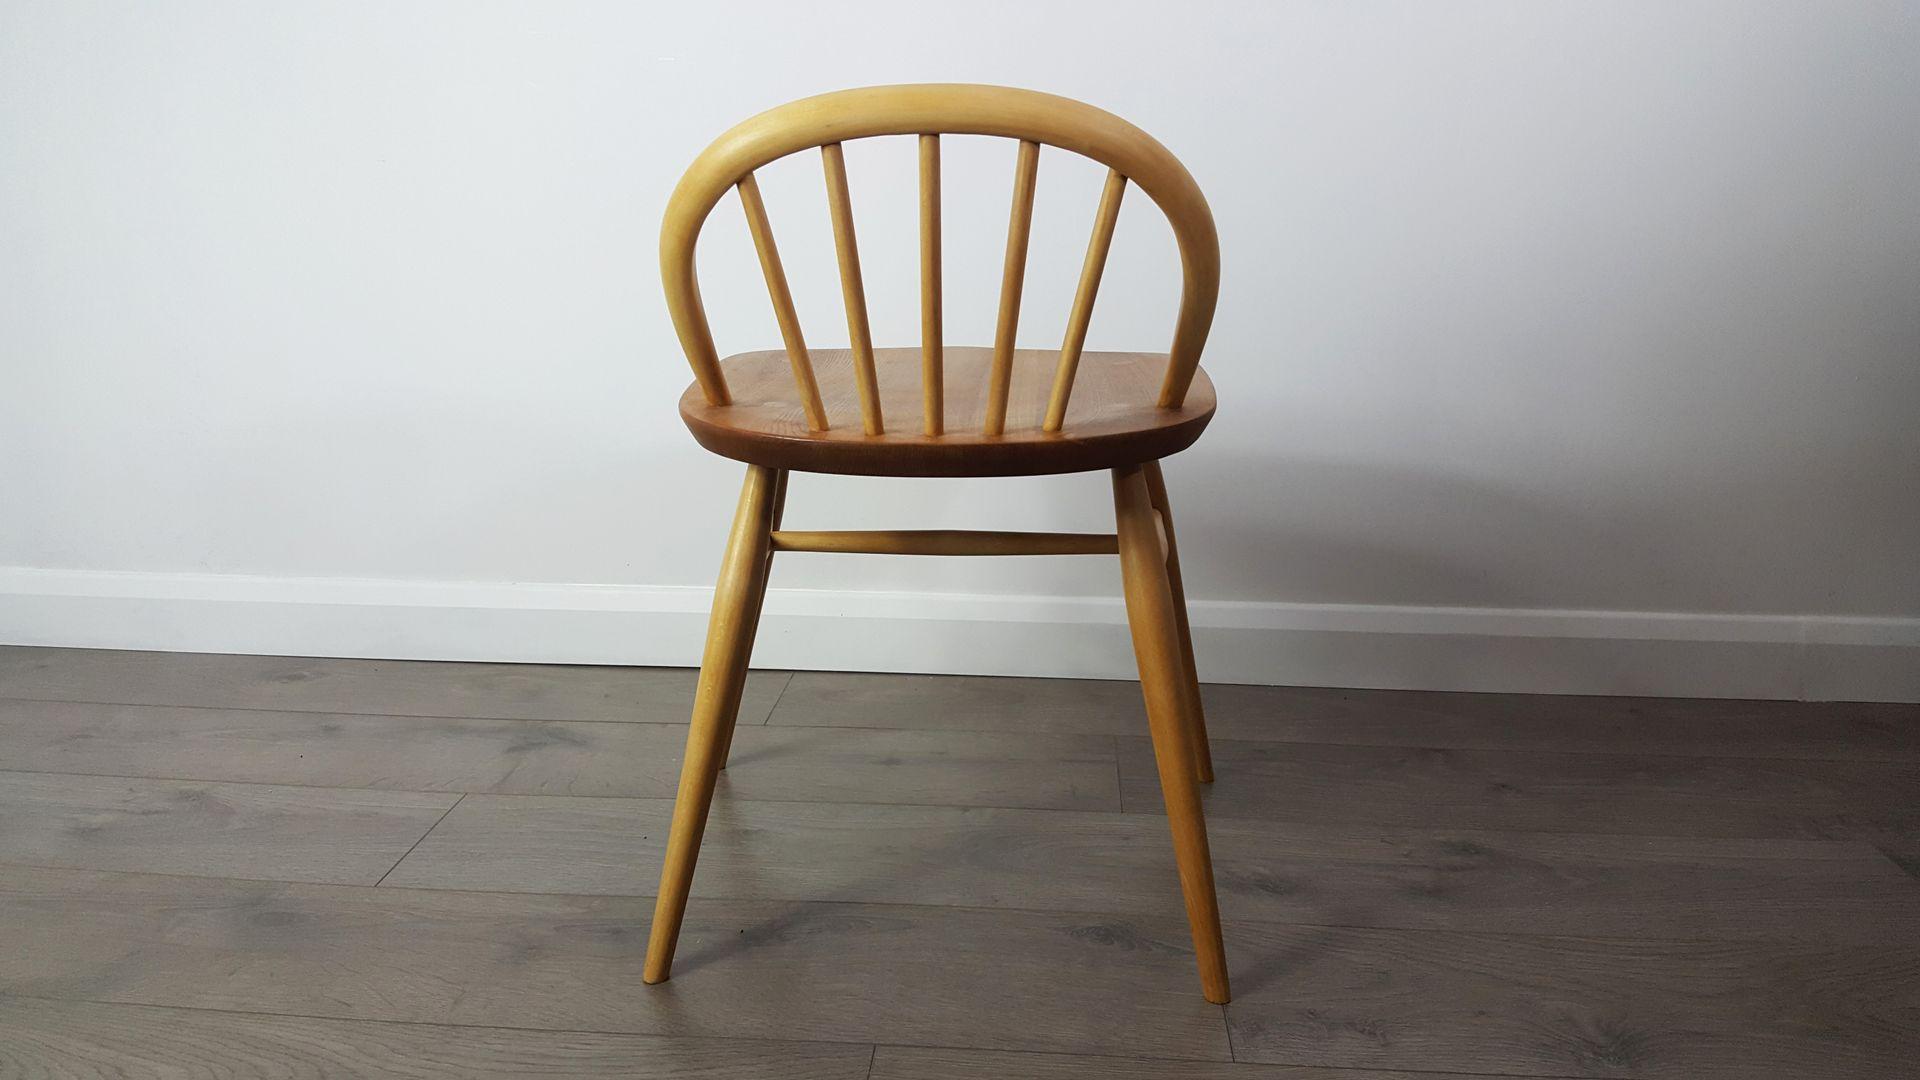 Windsor stuhl von lucian ercolani f r ercol 1960er bei pamono kaufen - Windsor stuhl ...